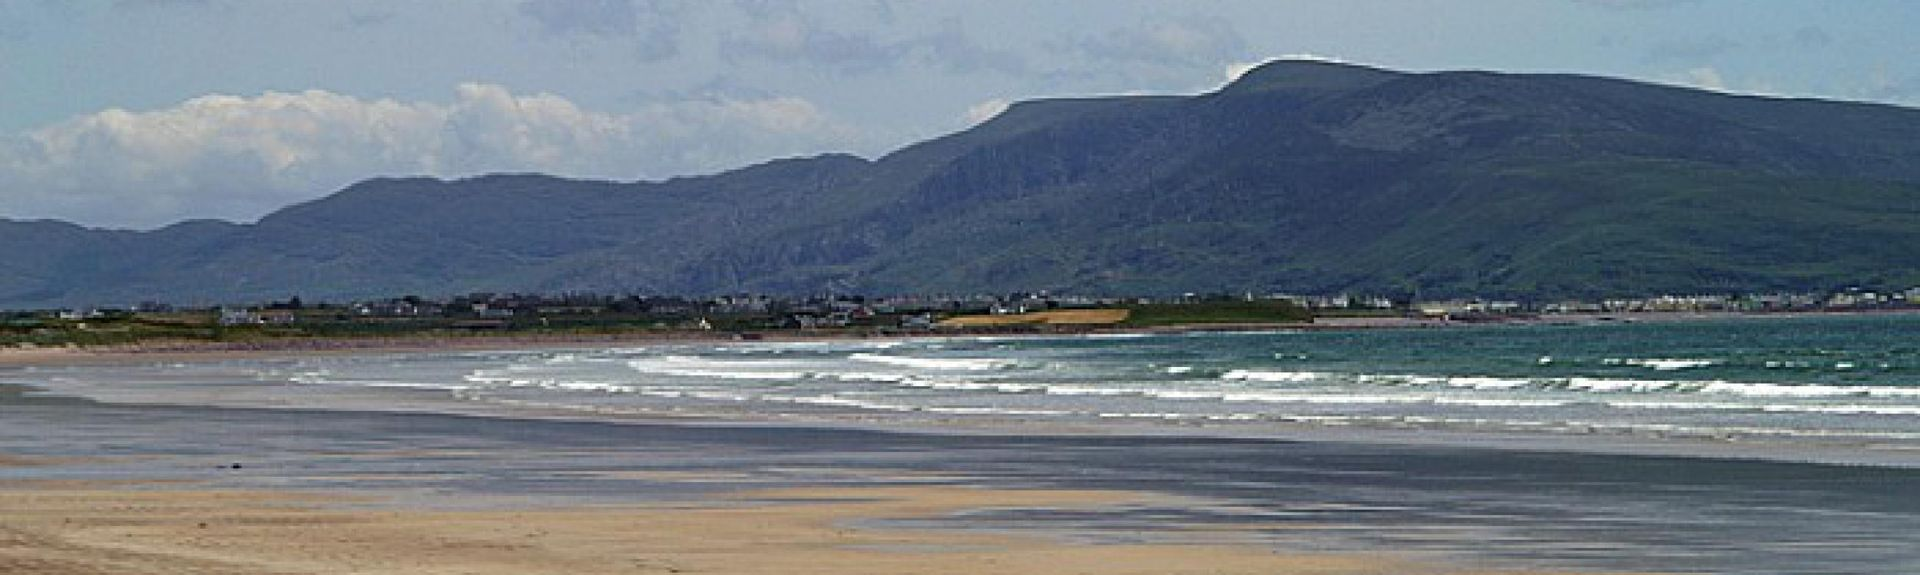 Irish Adventures, Dingle, County Kerry, Ireland